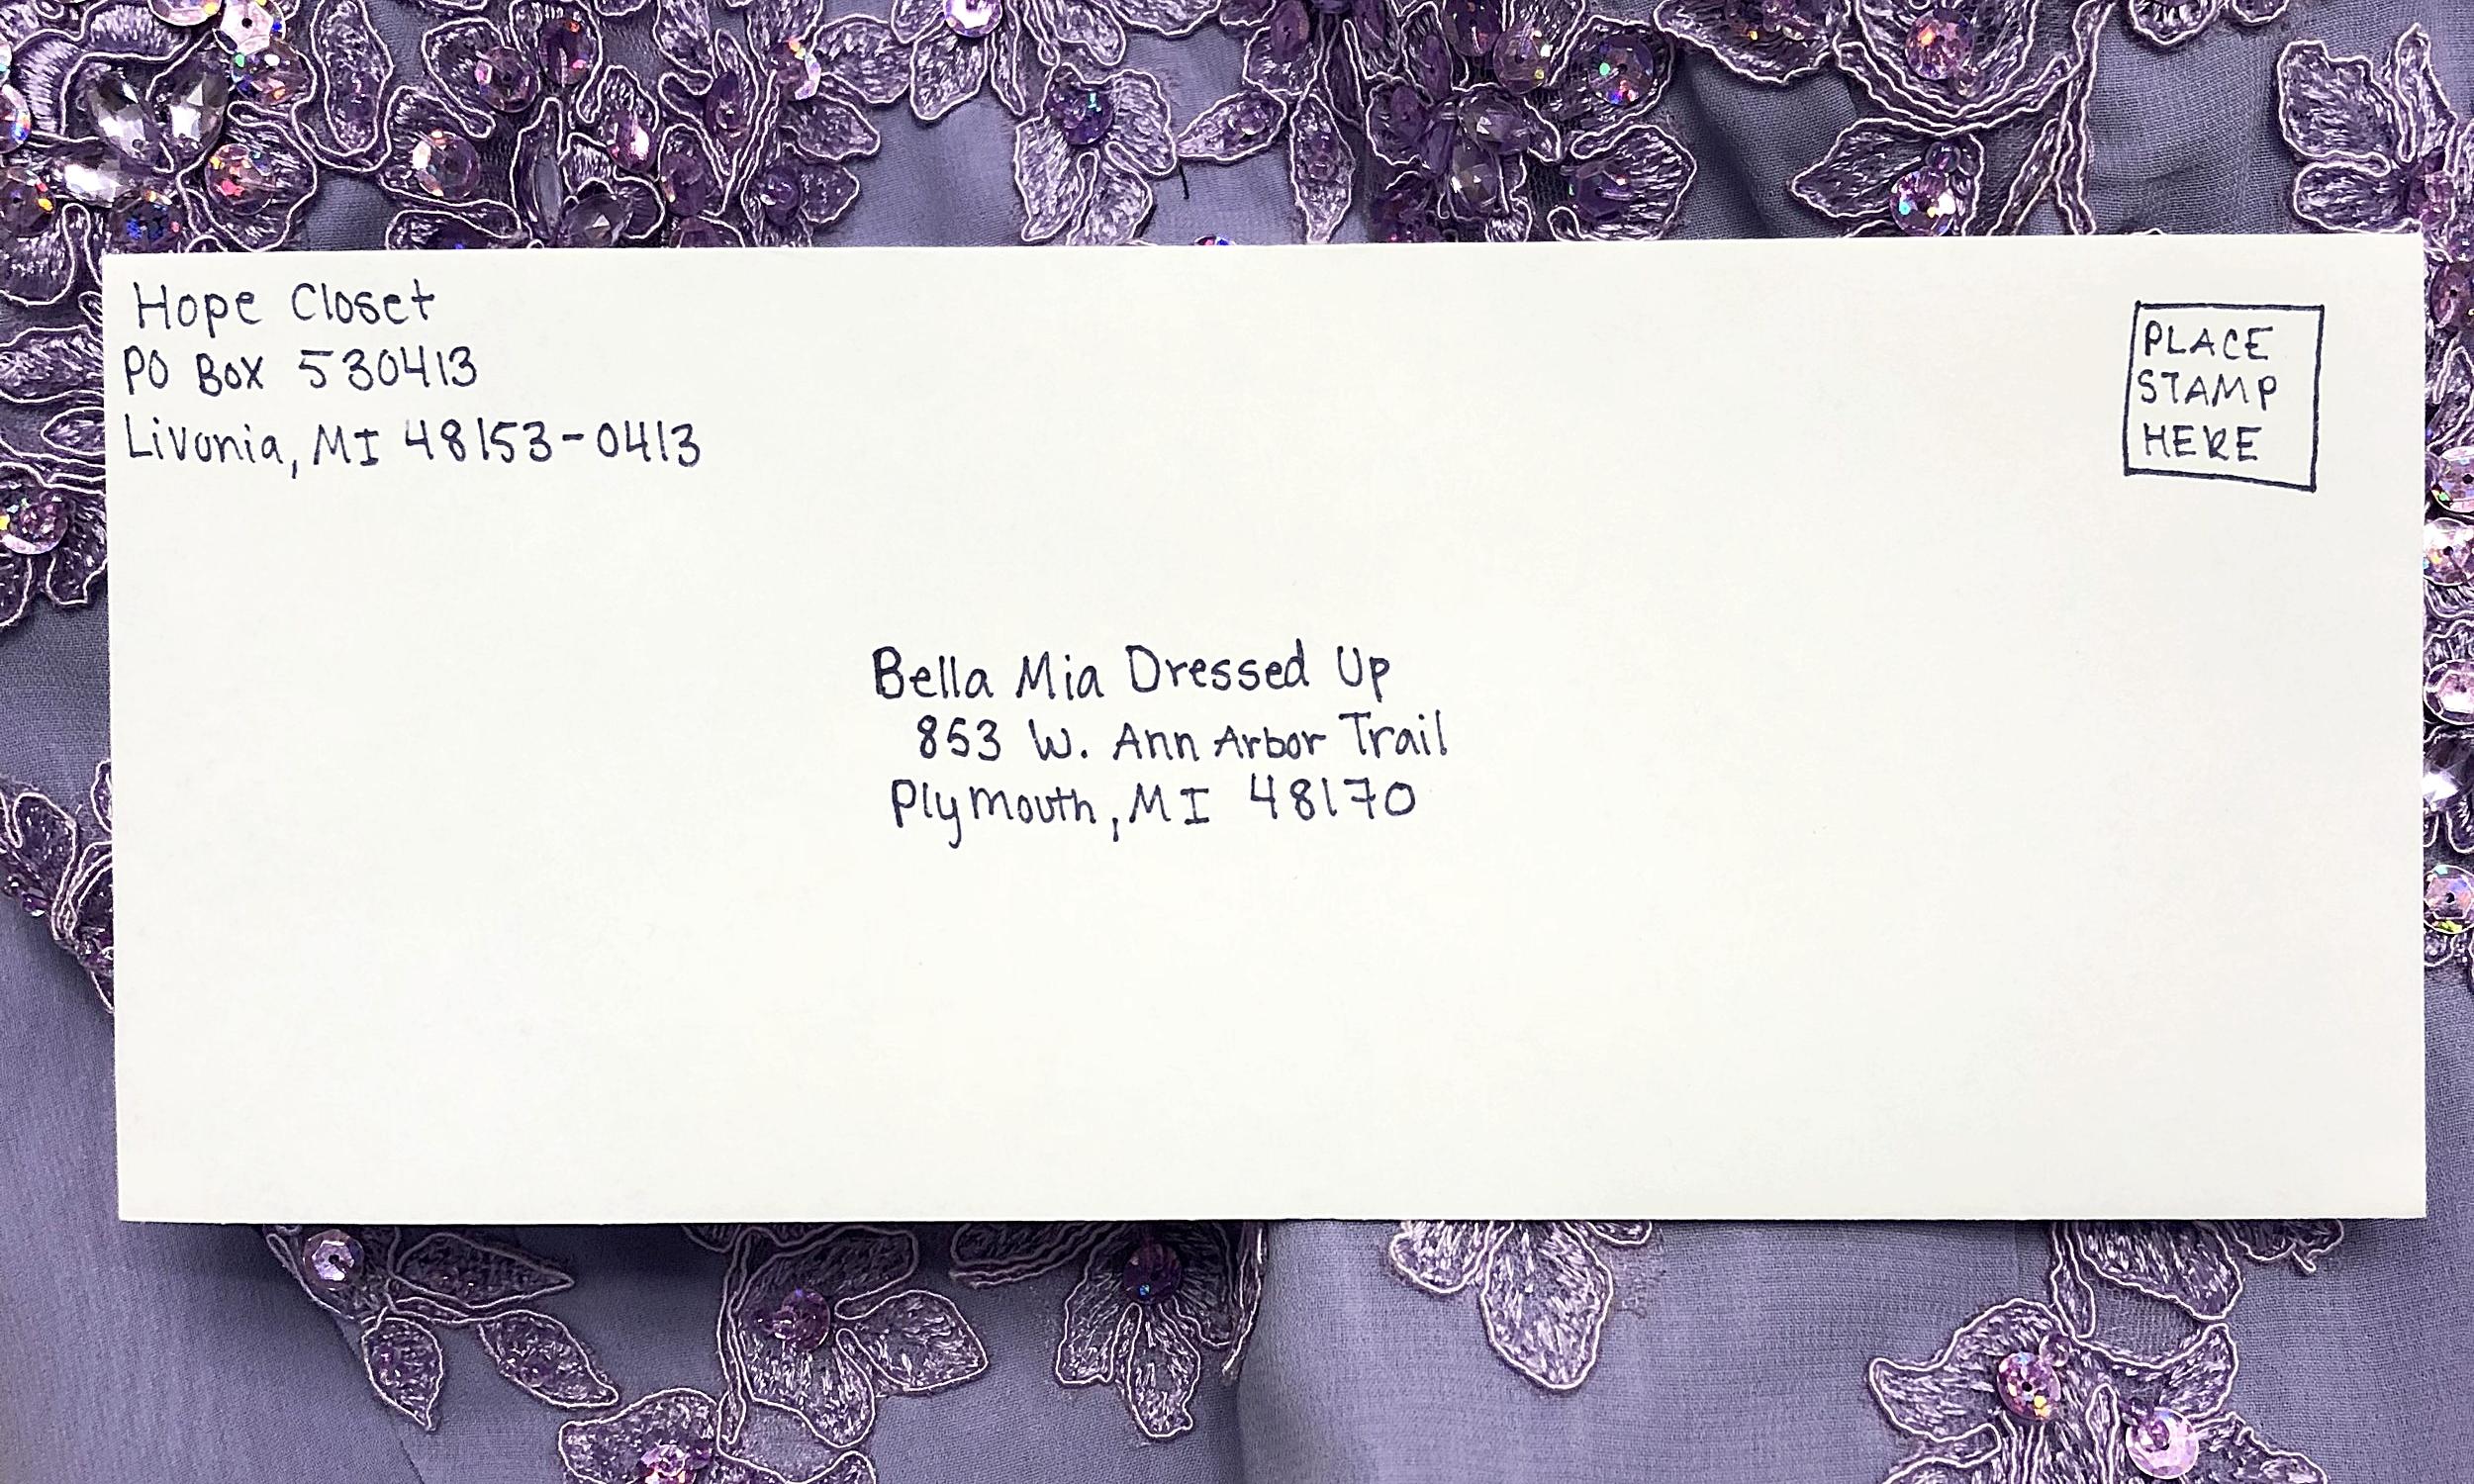 Bella-Mia-Dressed-Up-Hope-Closet-Donation-Addressed-Envelope.jpg